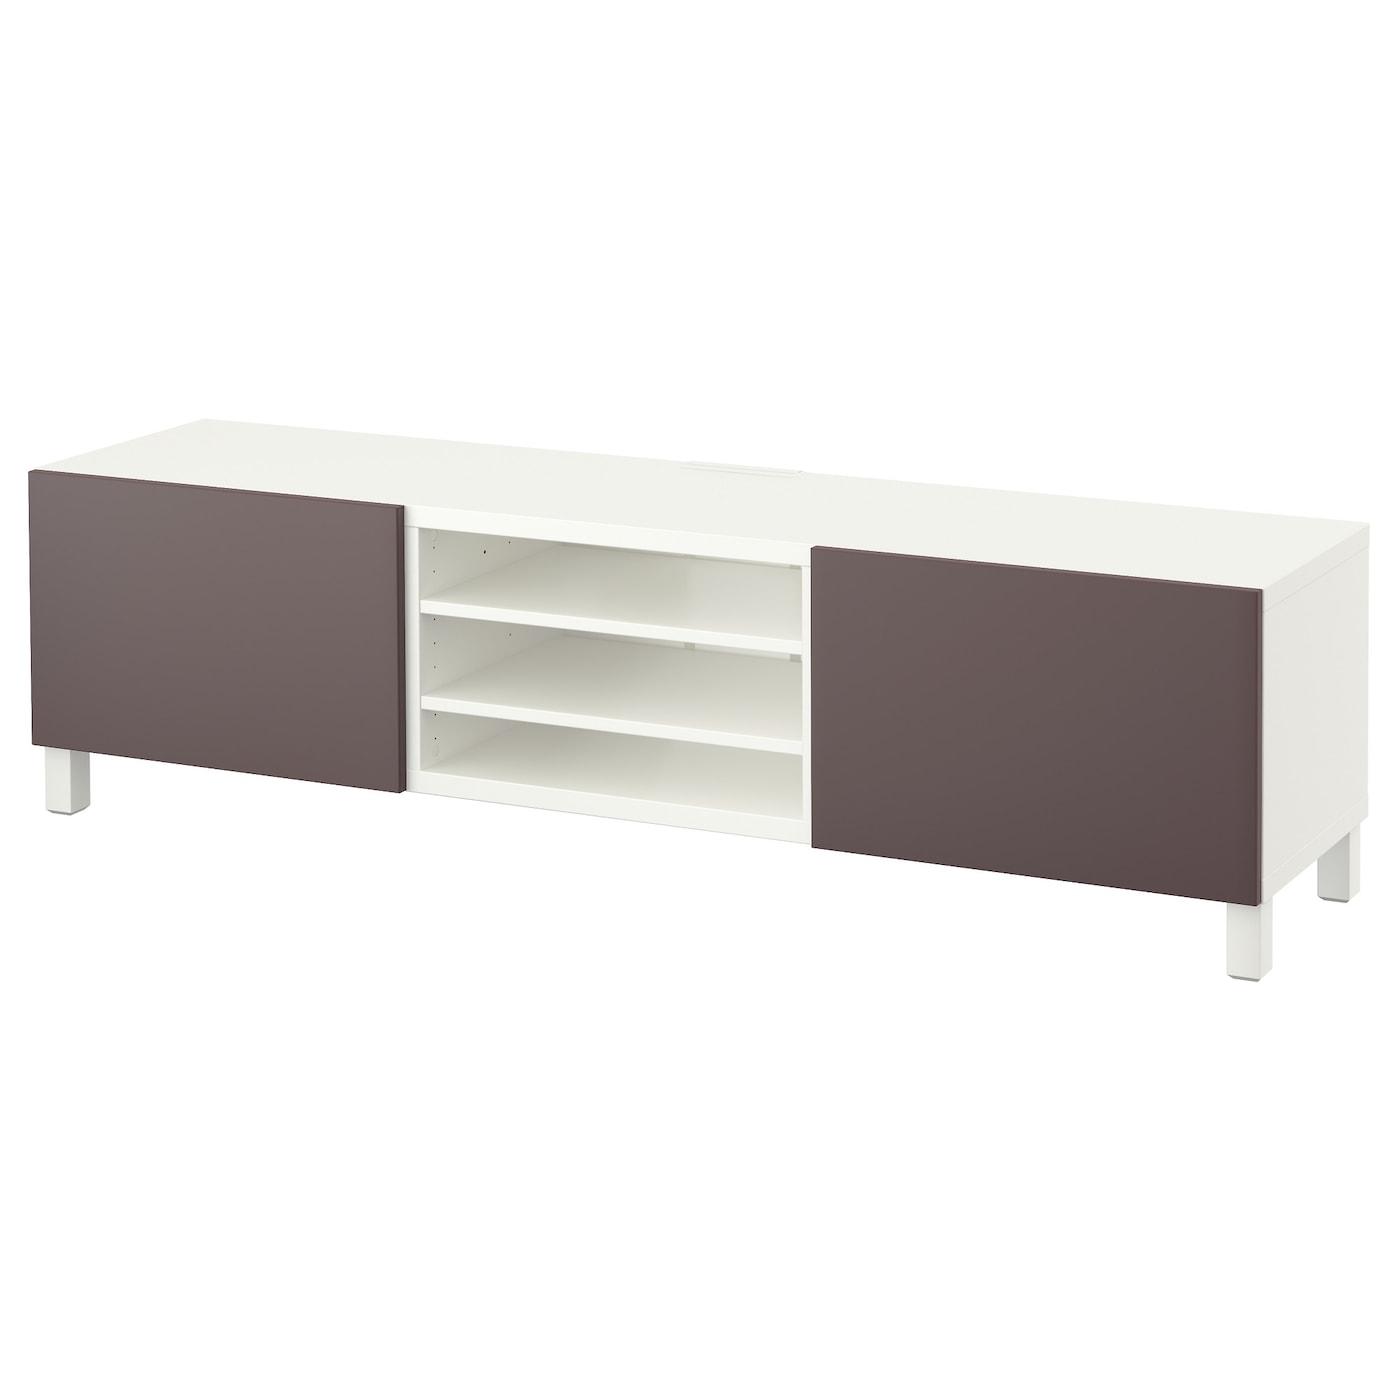 Best Banc Tv Avec Tiroirs Blanc Valviken Brun Fonc 180x40x48 Cm  # Ikea Meuble Tv Blanc Laque